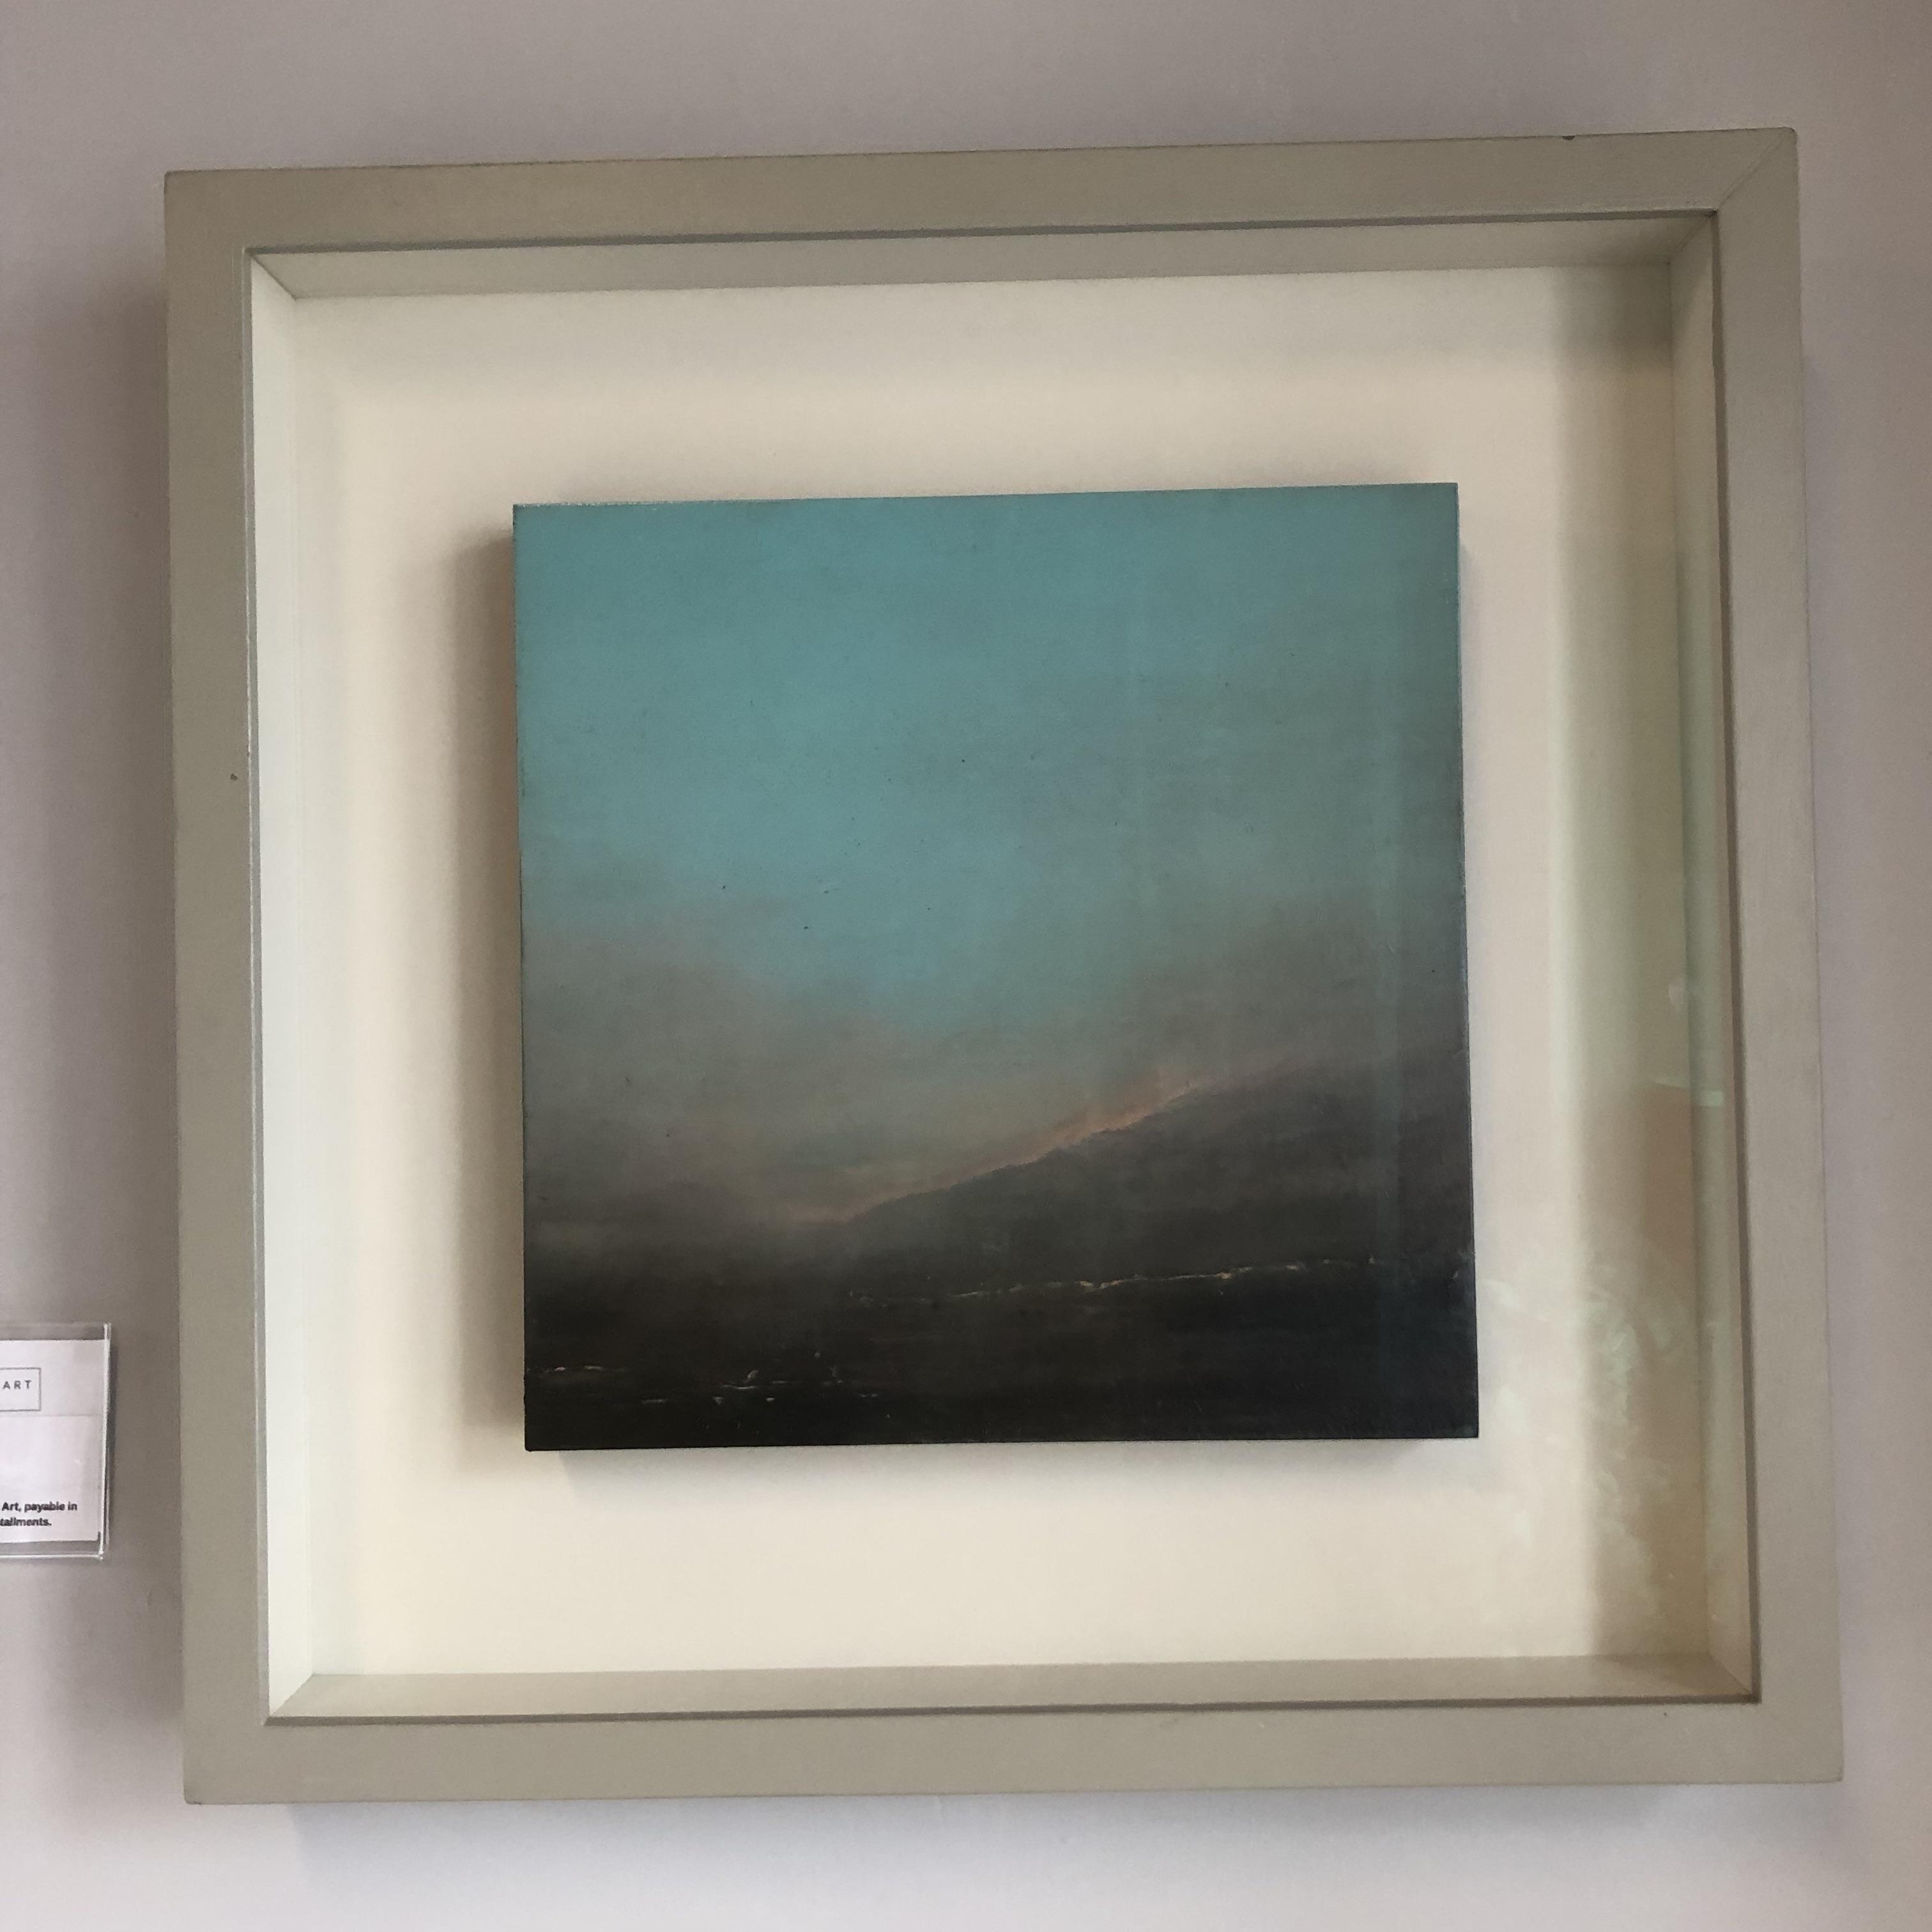 "Richard Whadcock, ""Toward Eventide"" Oil on panel, 30x30cm, framed landscape painting."